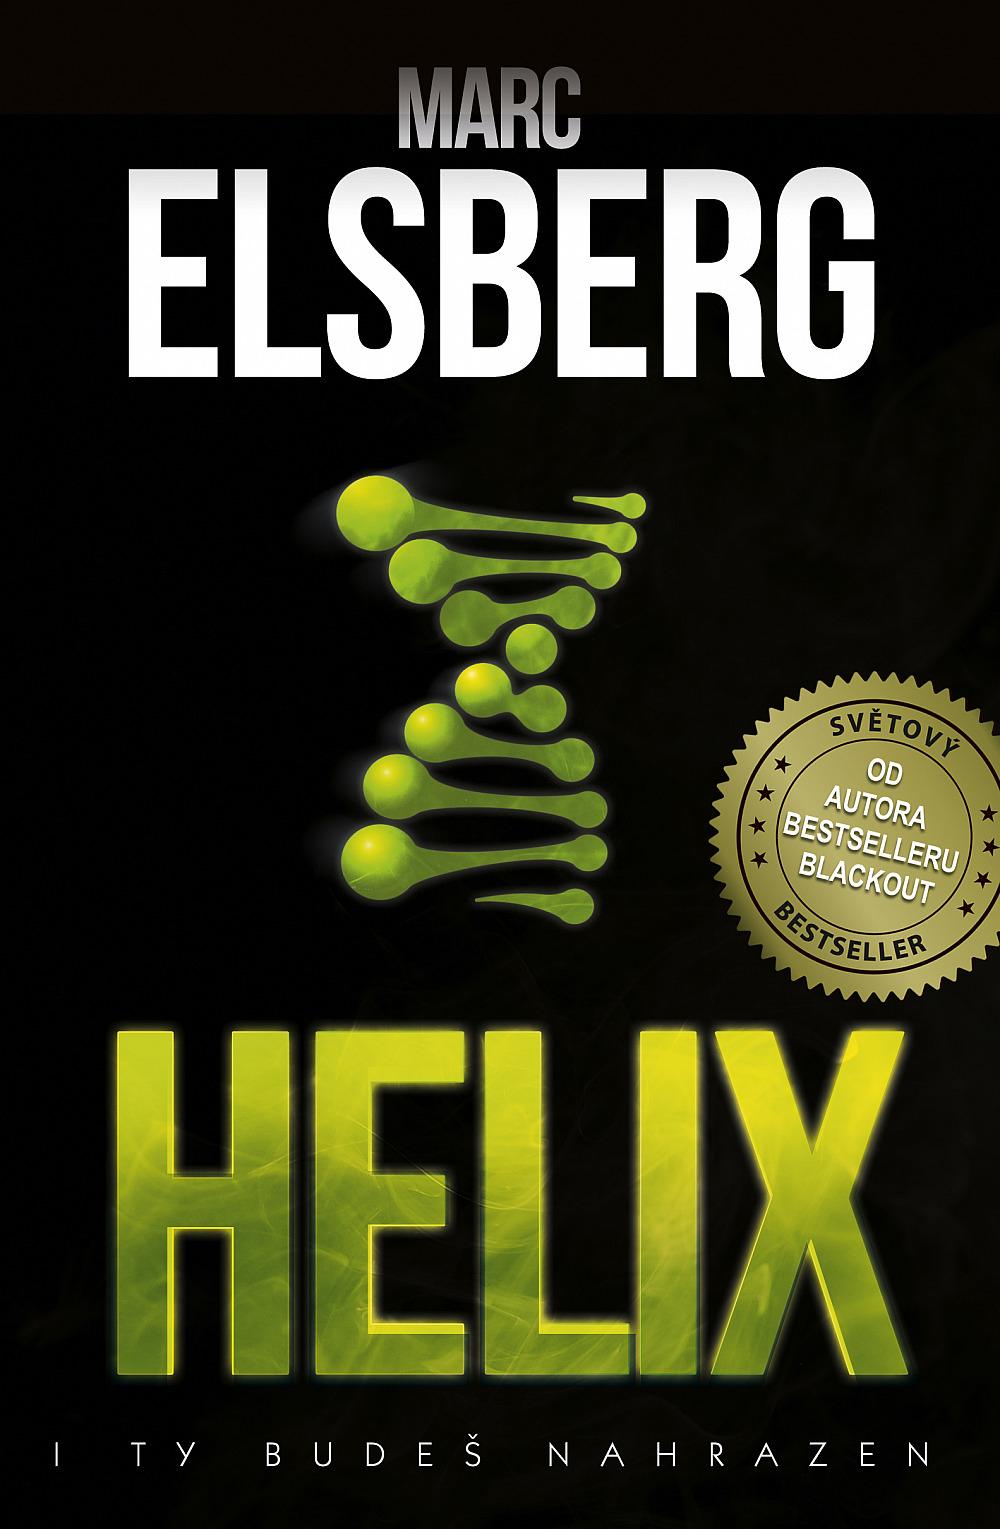 big_helix-fWU-415279